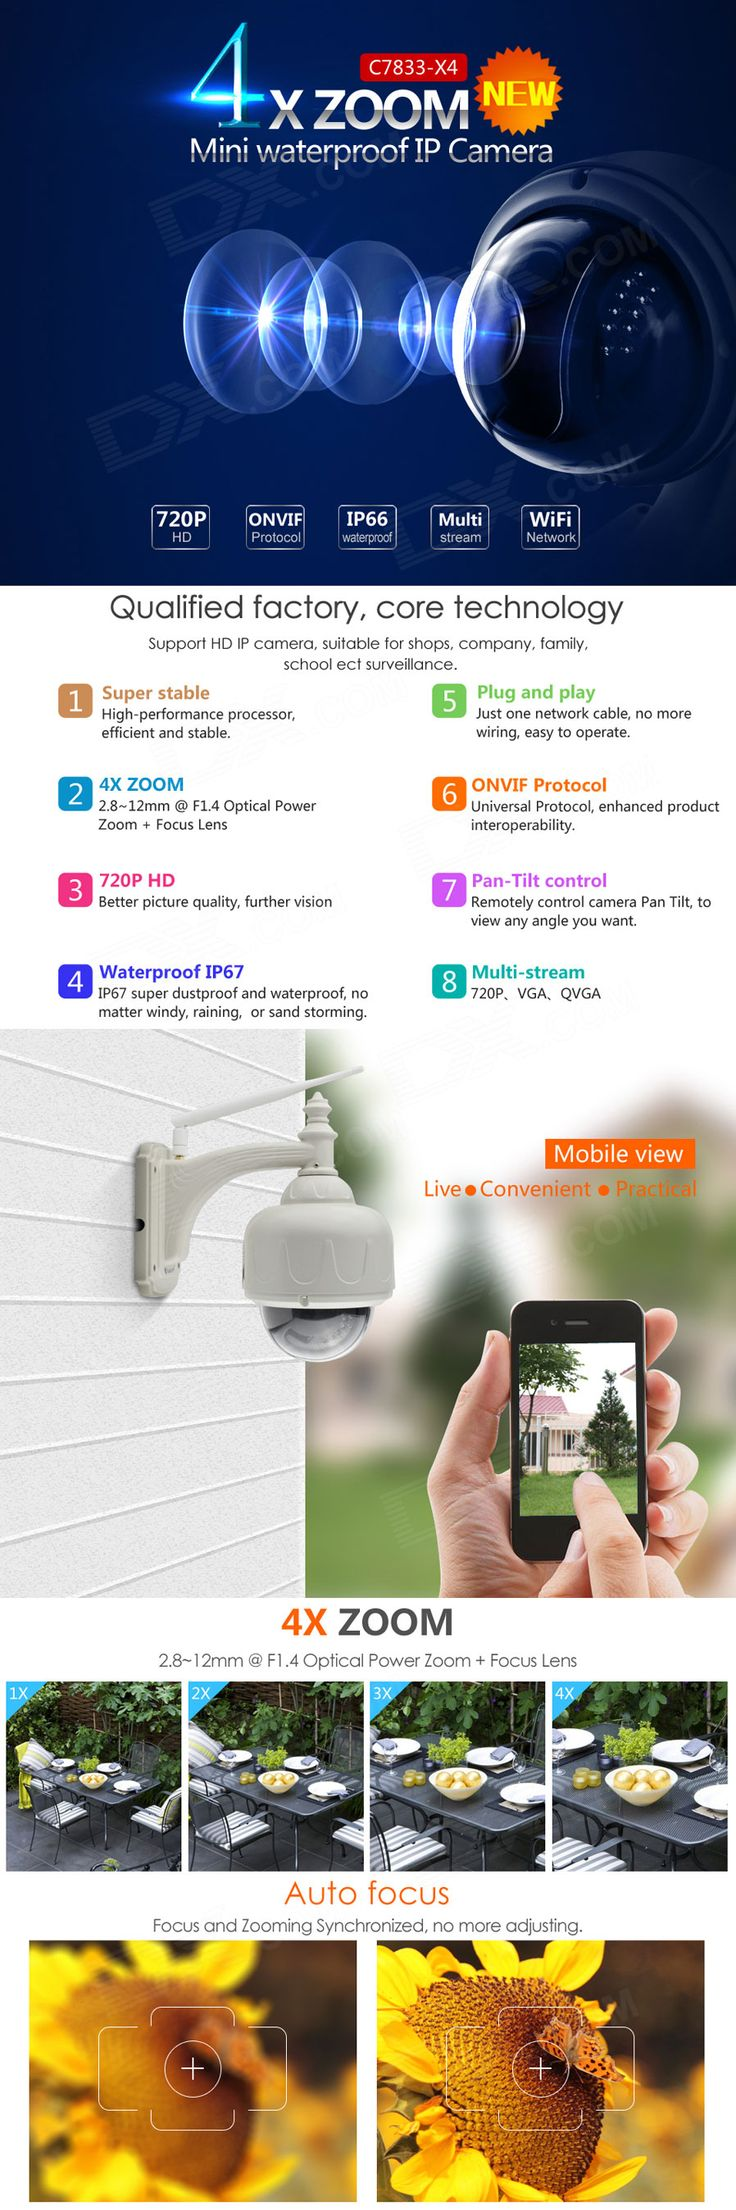 VSTARCAM C7833WIP-X4 720P 1.0MP PTZ Wireless IP Camera - Grey - Free Shipping - DealExtreme